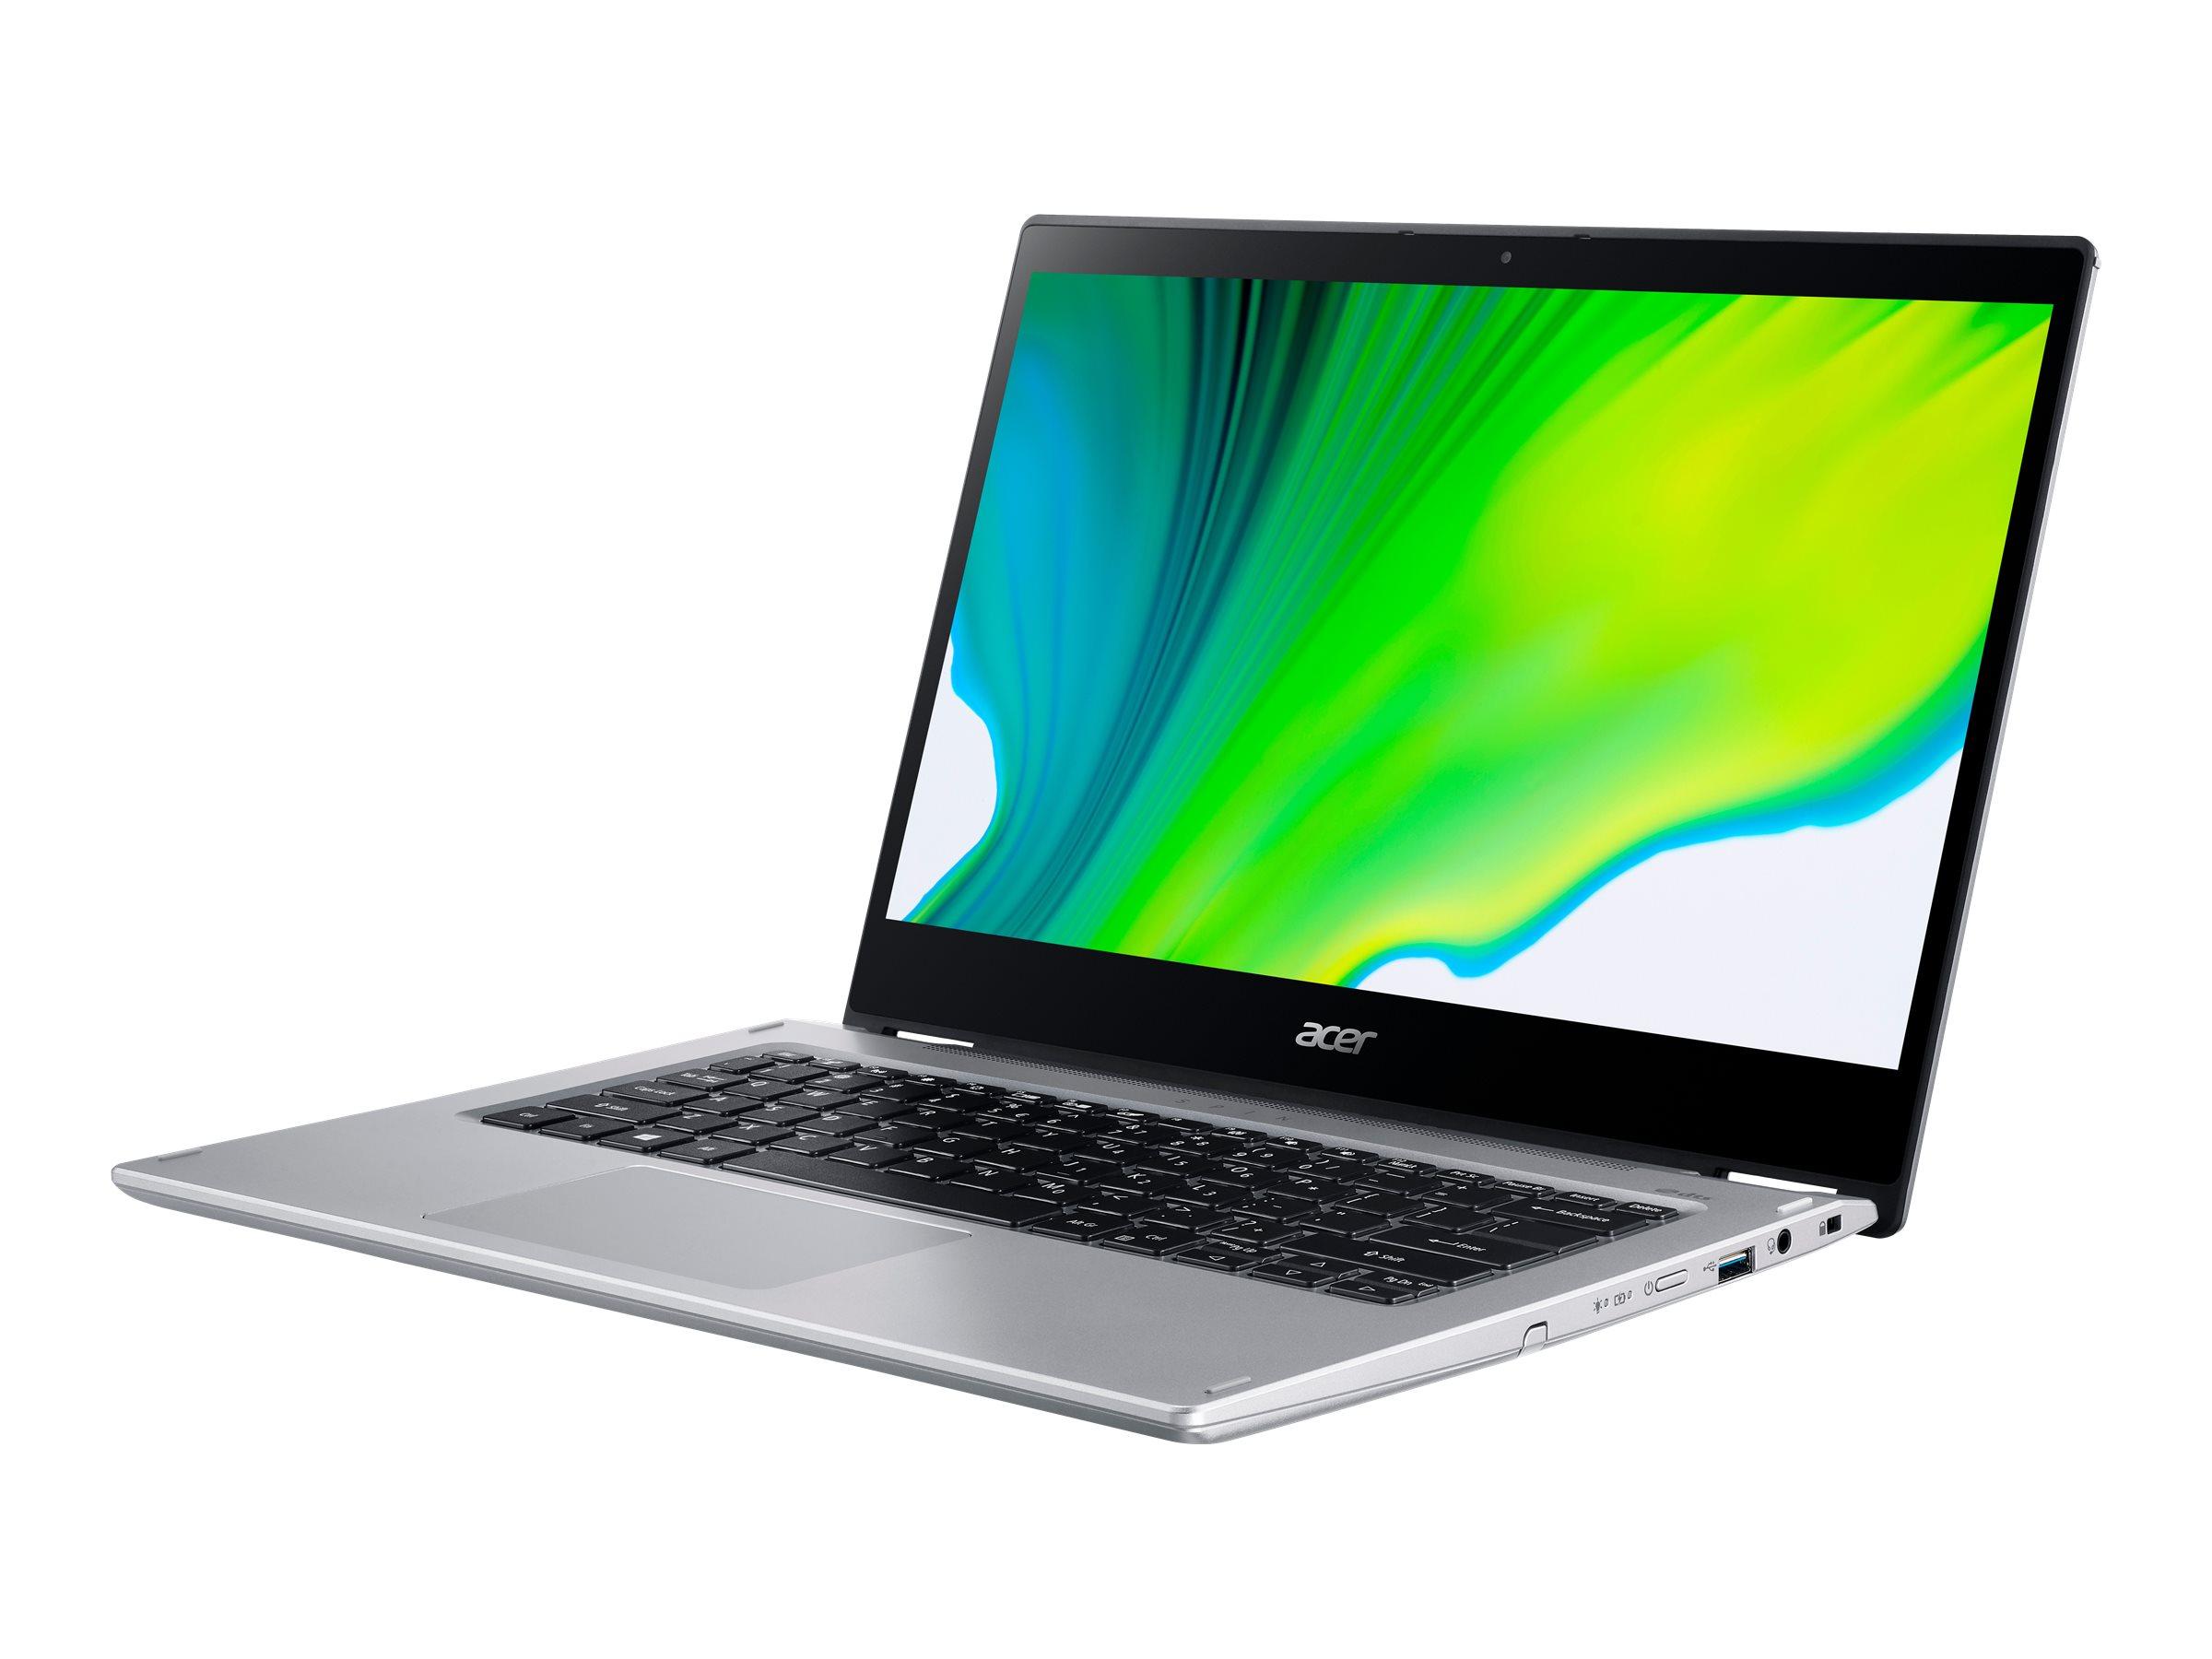 "Vorschau: Acer Spin 3 SP314-54N-57C3 - Flip-Design - Core i5 1035G4 / 1.1 GHz - Win 10 Pro 64-Bit - 8 GB RAM - 256 GB SSD - 35.56 cm (14"")"